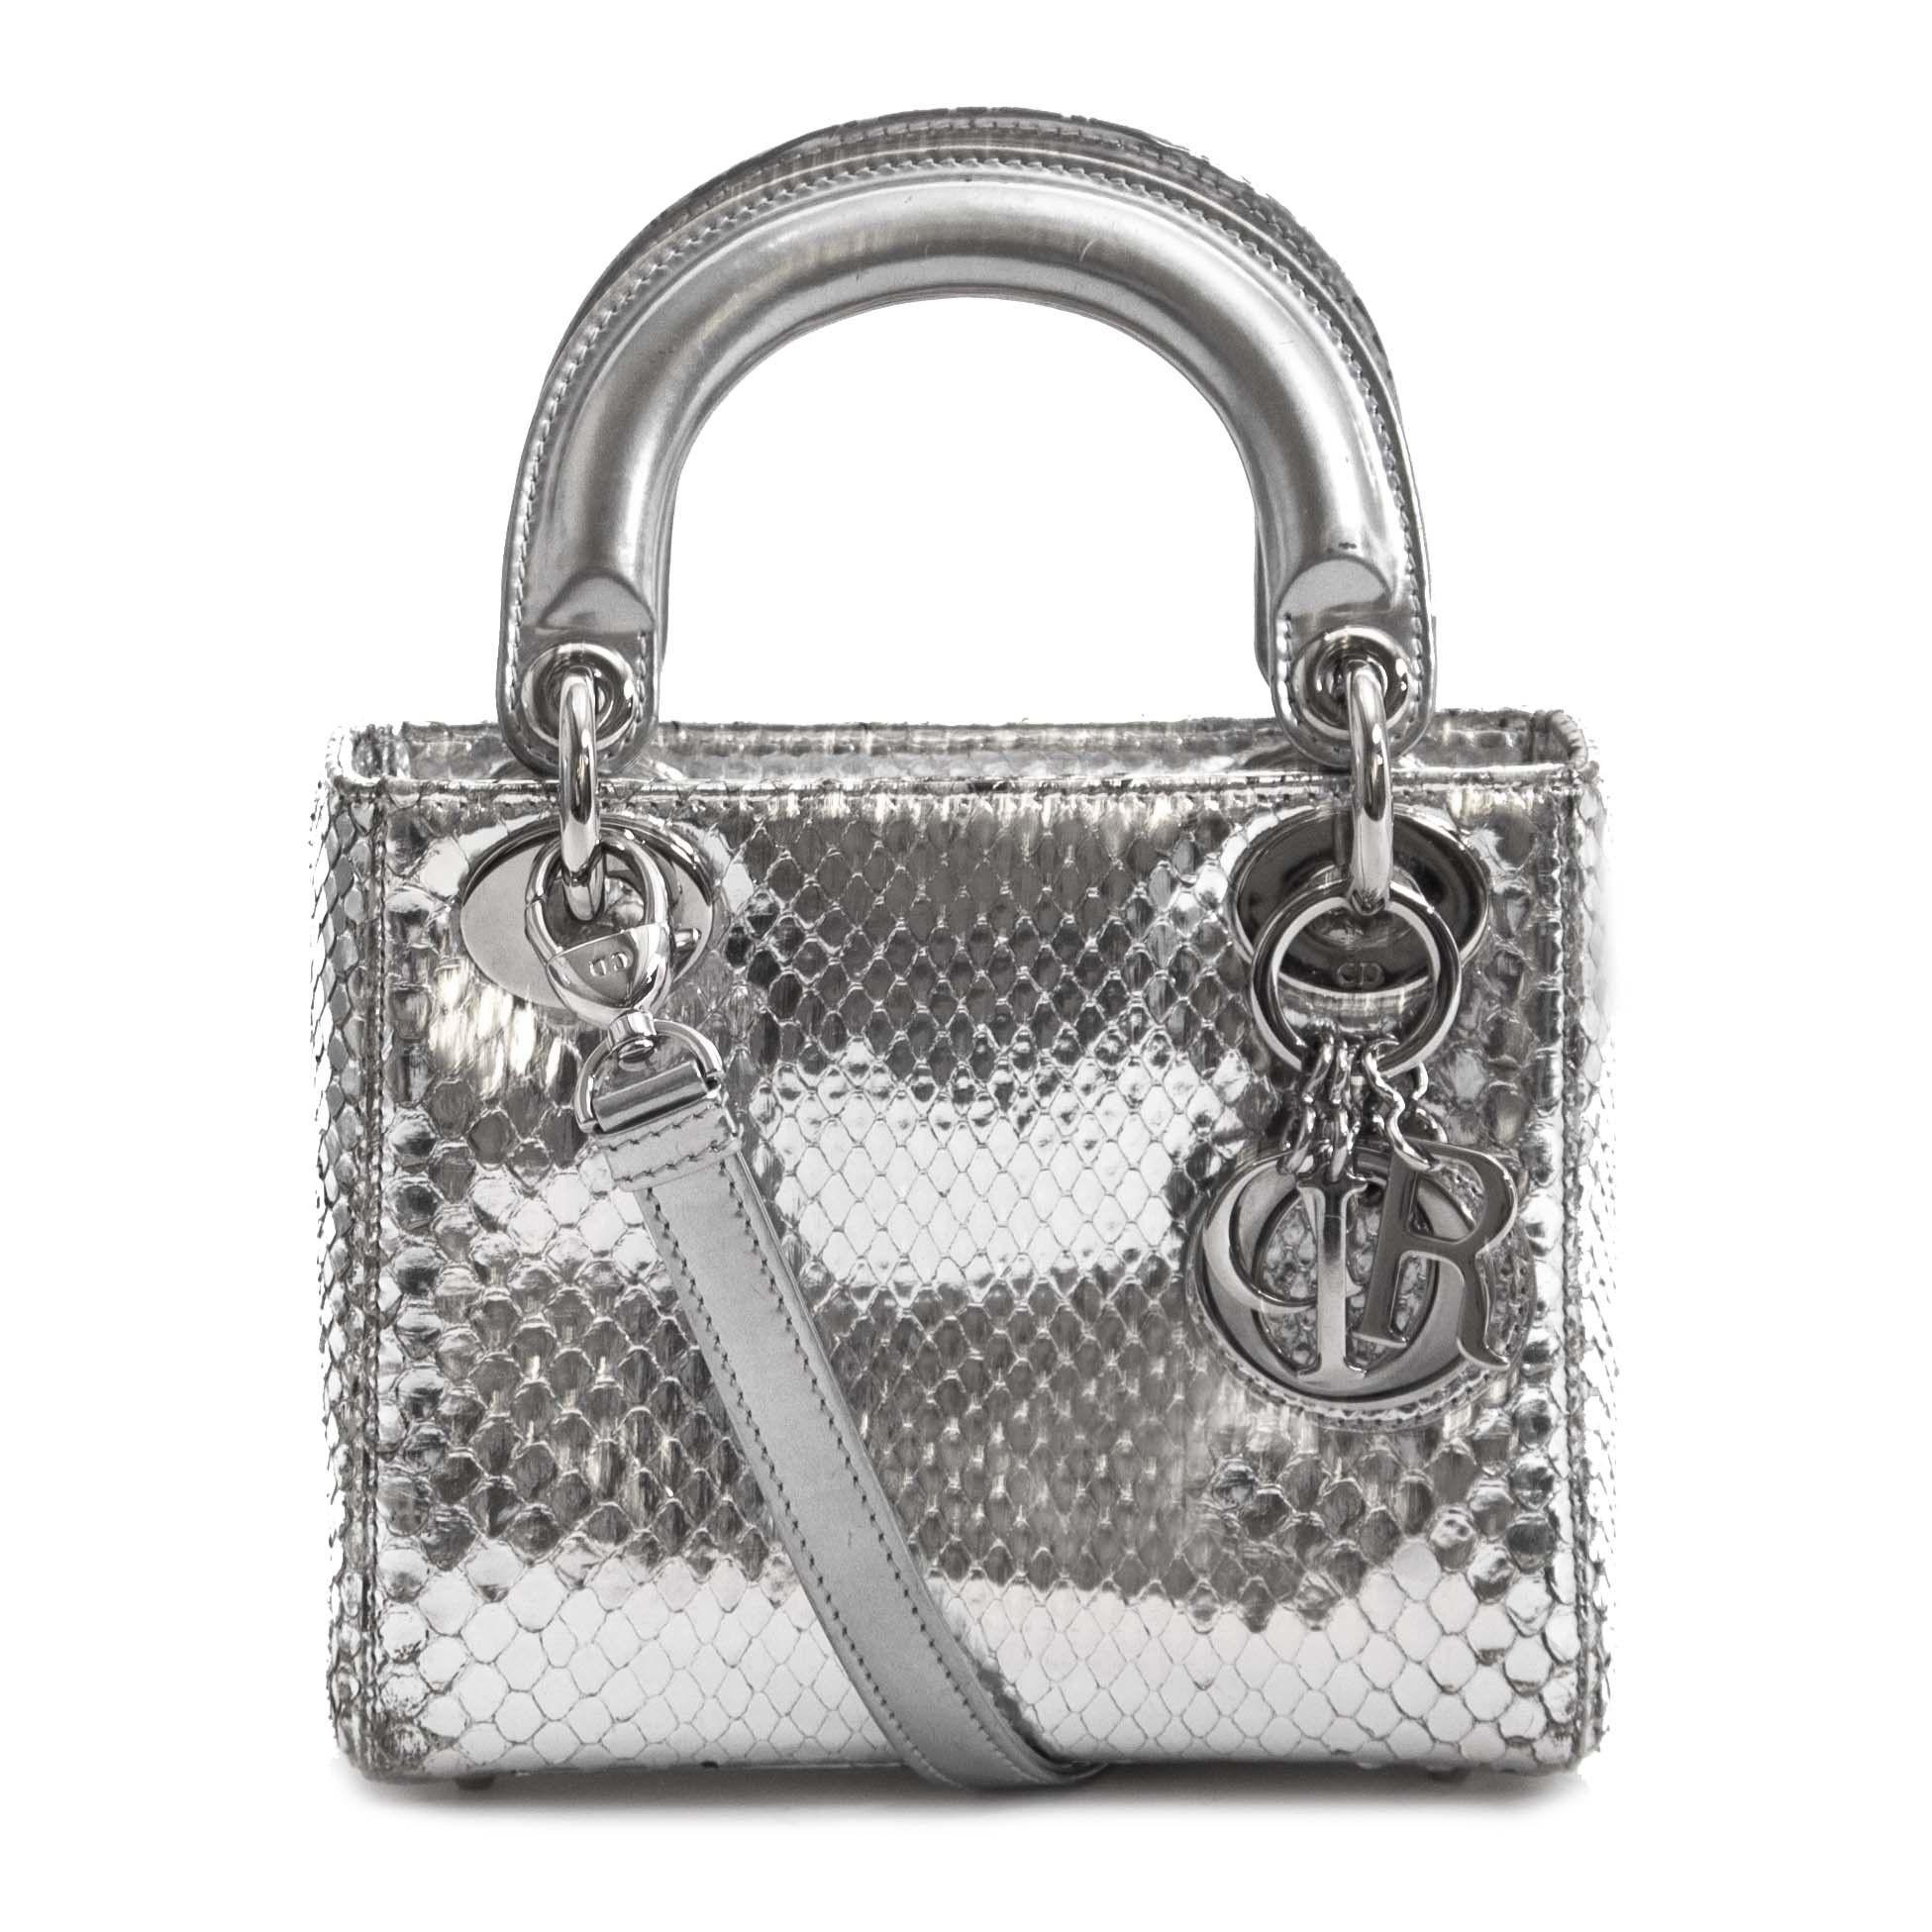 9d542ff19aabb3 Dior Silvery Python Mini Lady Dior Bag | Shop Labellov in 2019 ...